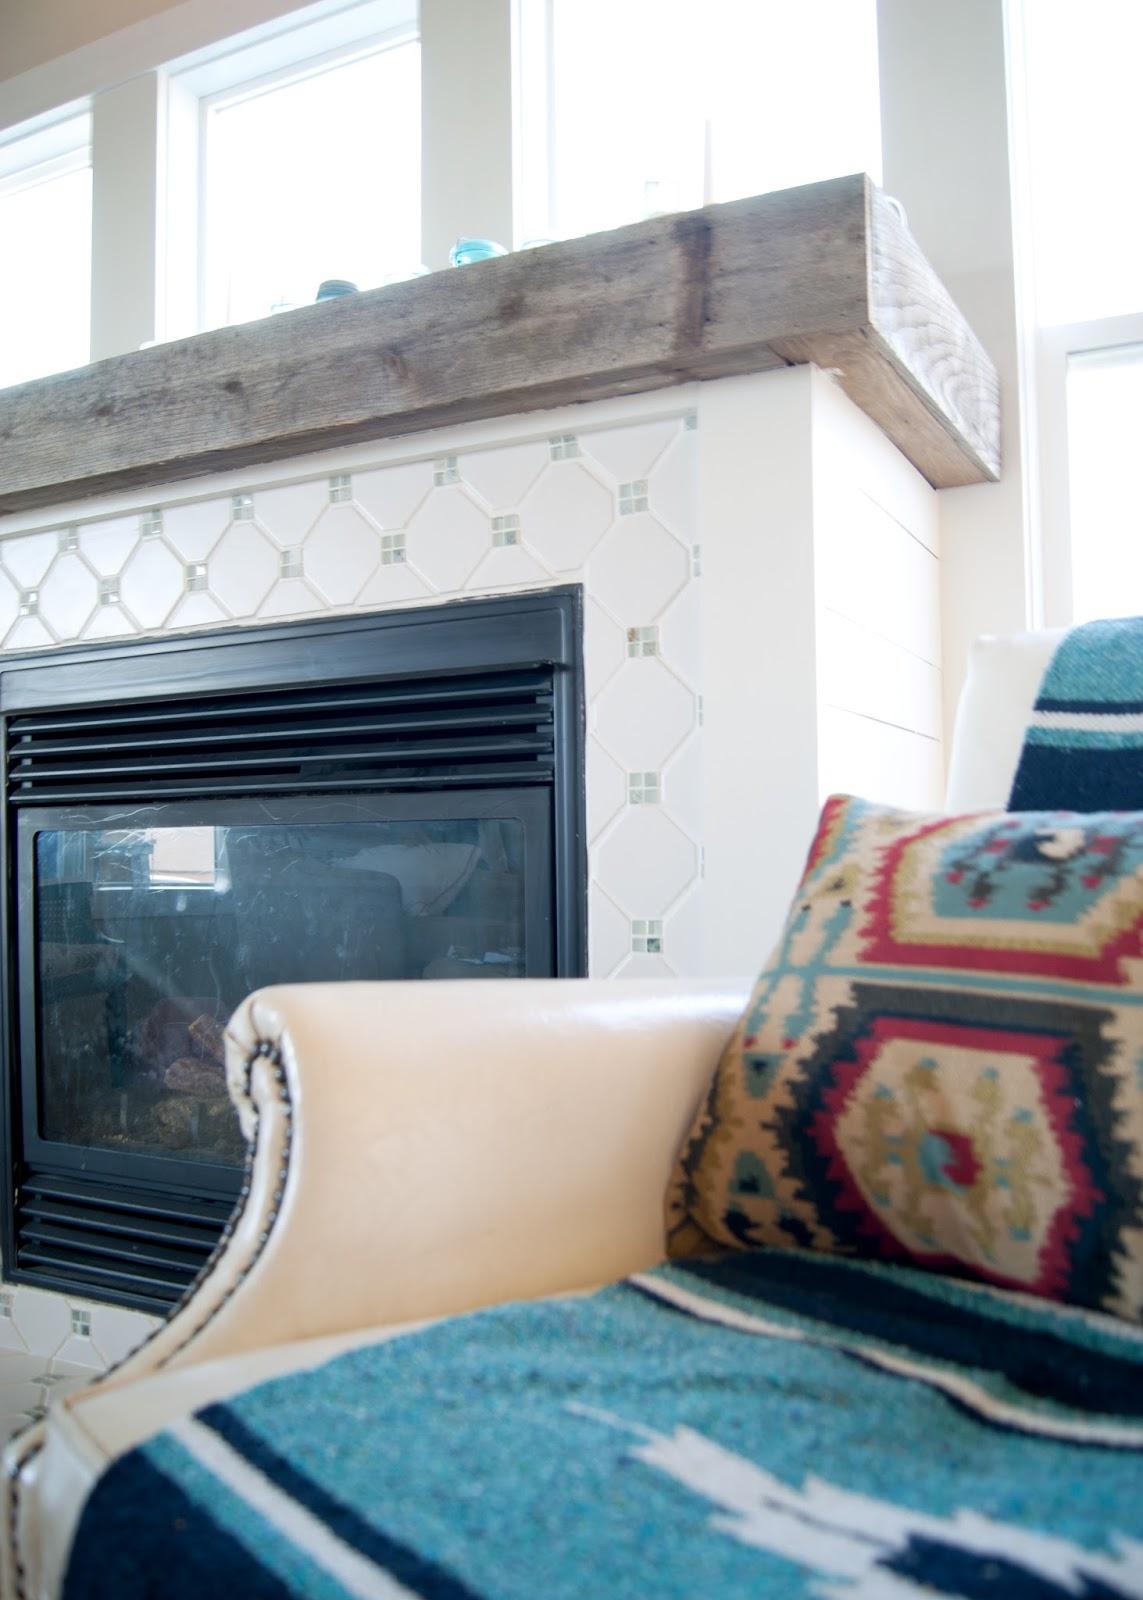 Fireplace, horse blanket, reclaimed wood